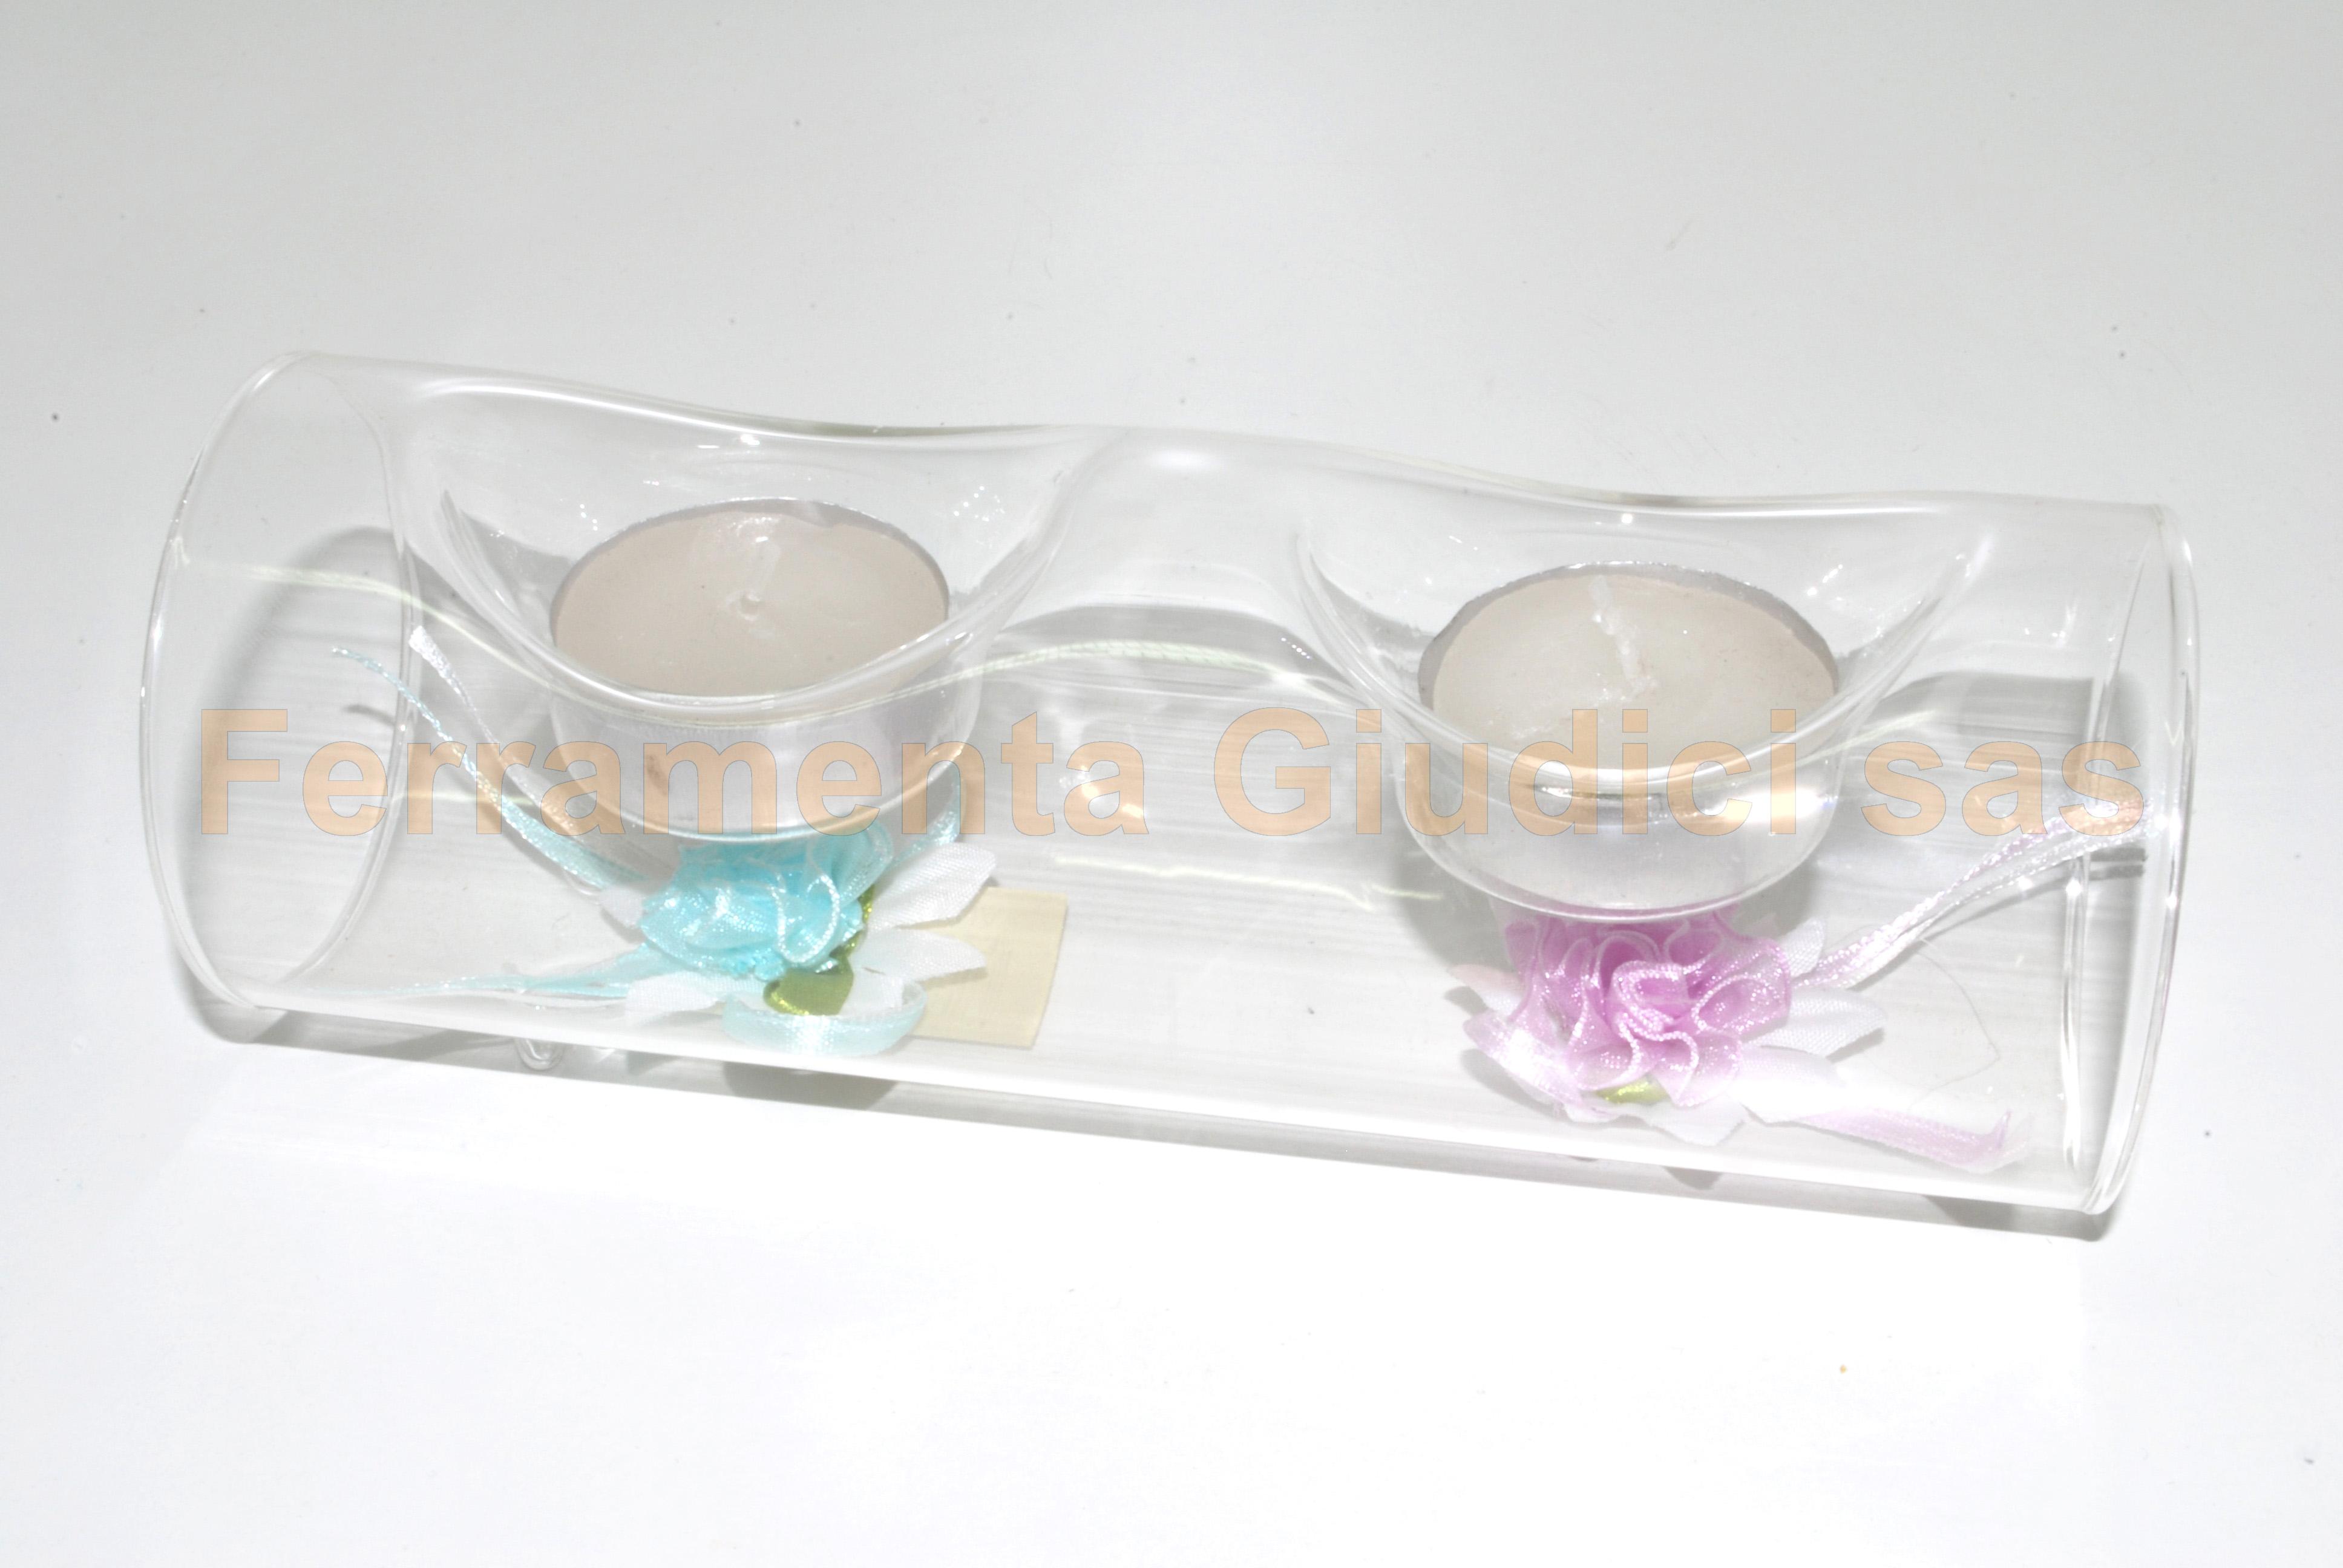 Portacandele vetro oggetti decorare decoupage ebay - Portacandele in vetro ...